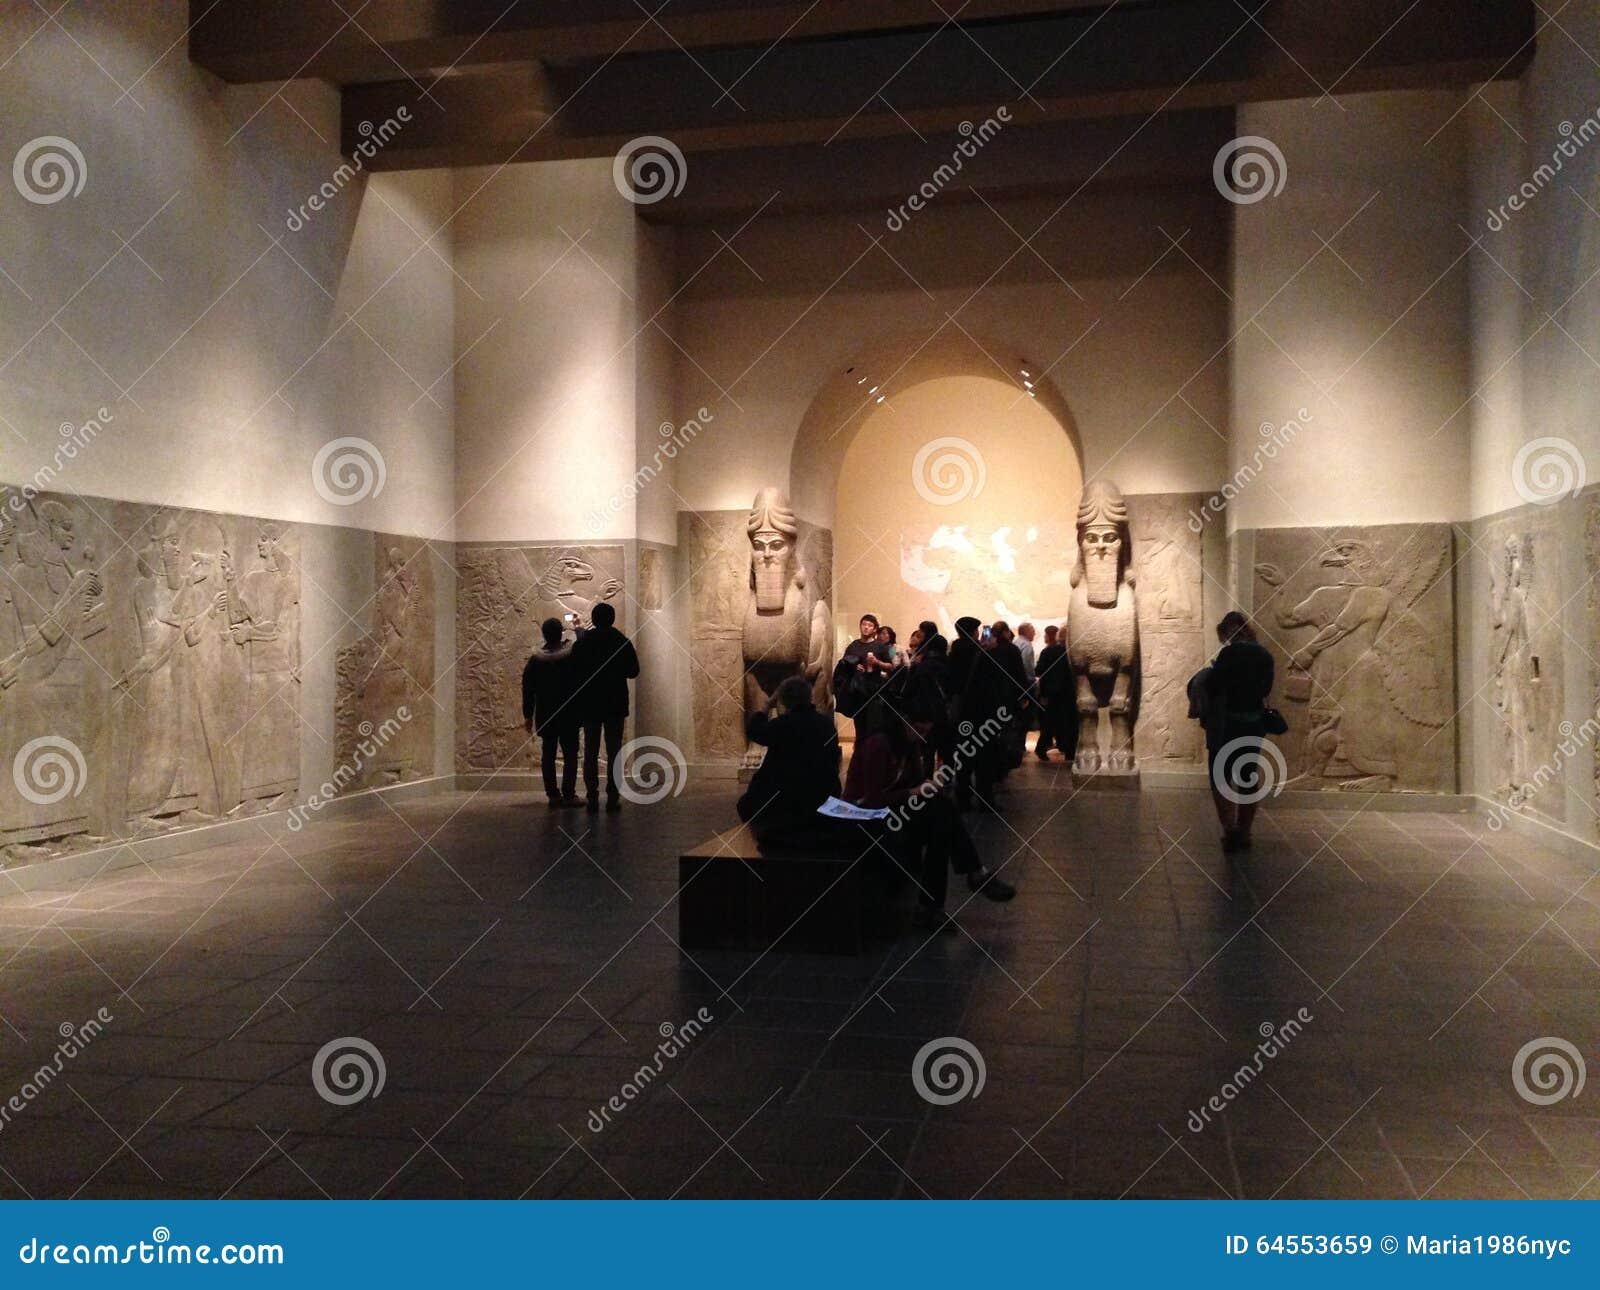 mesopotamia, iraq - assyrian gateway